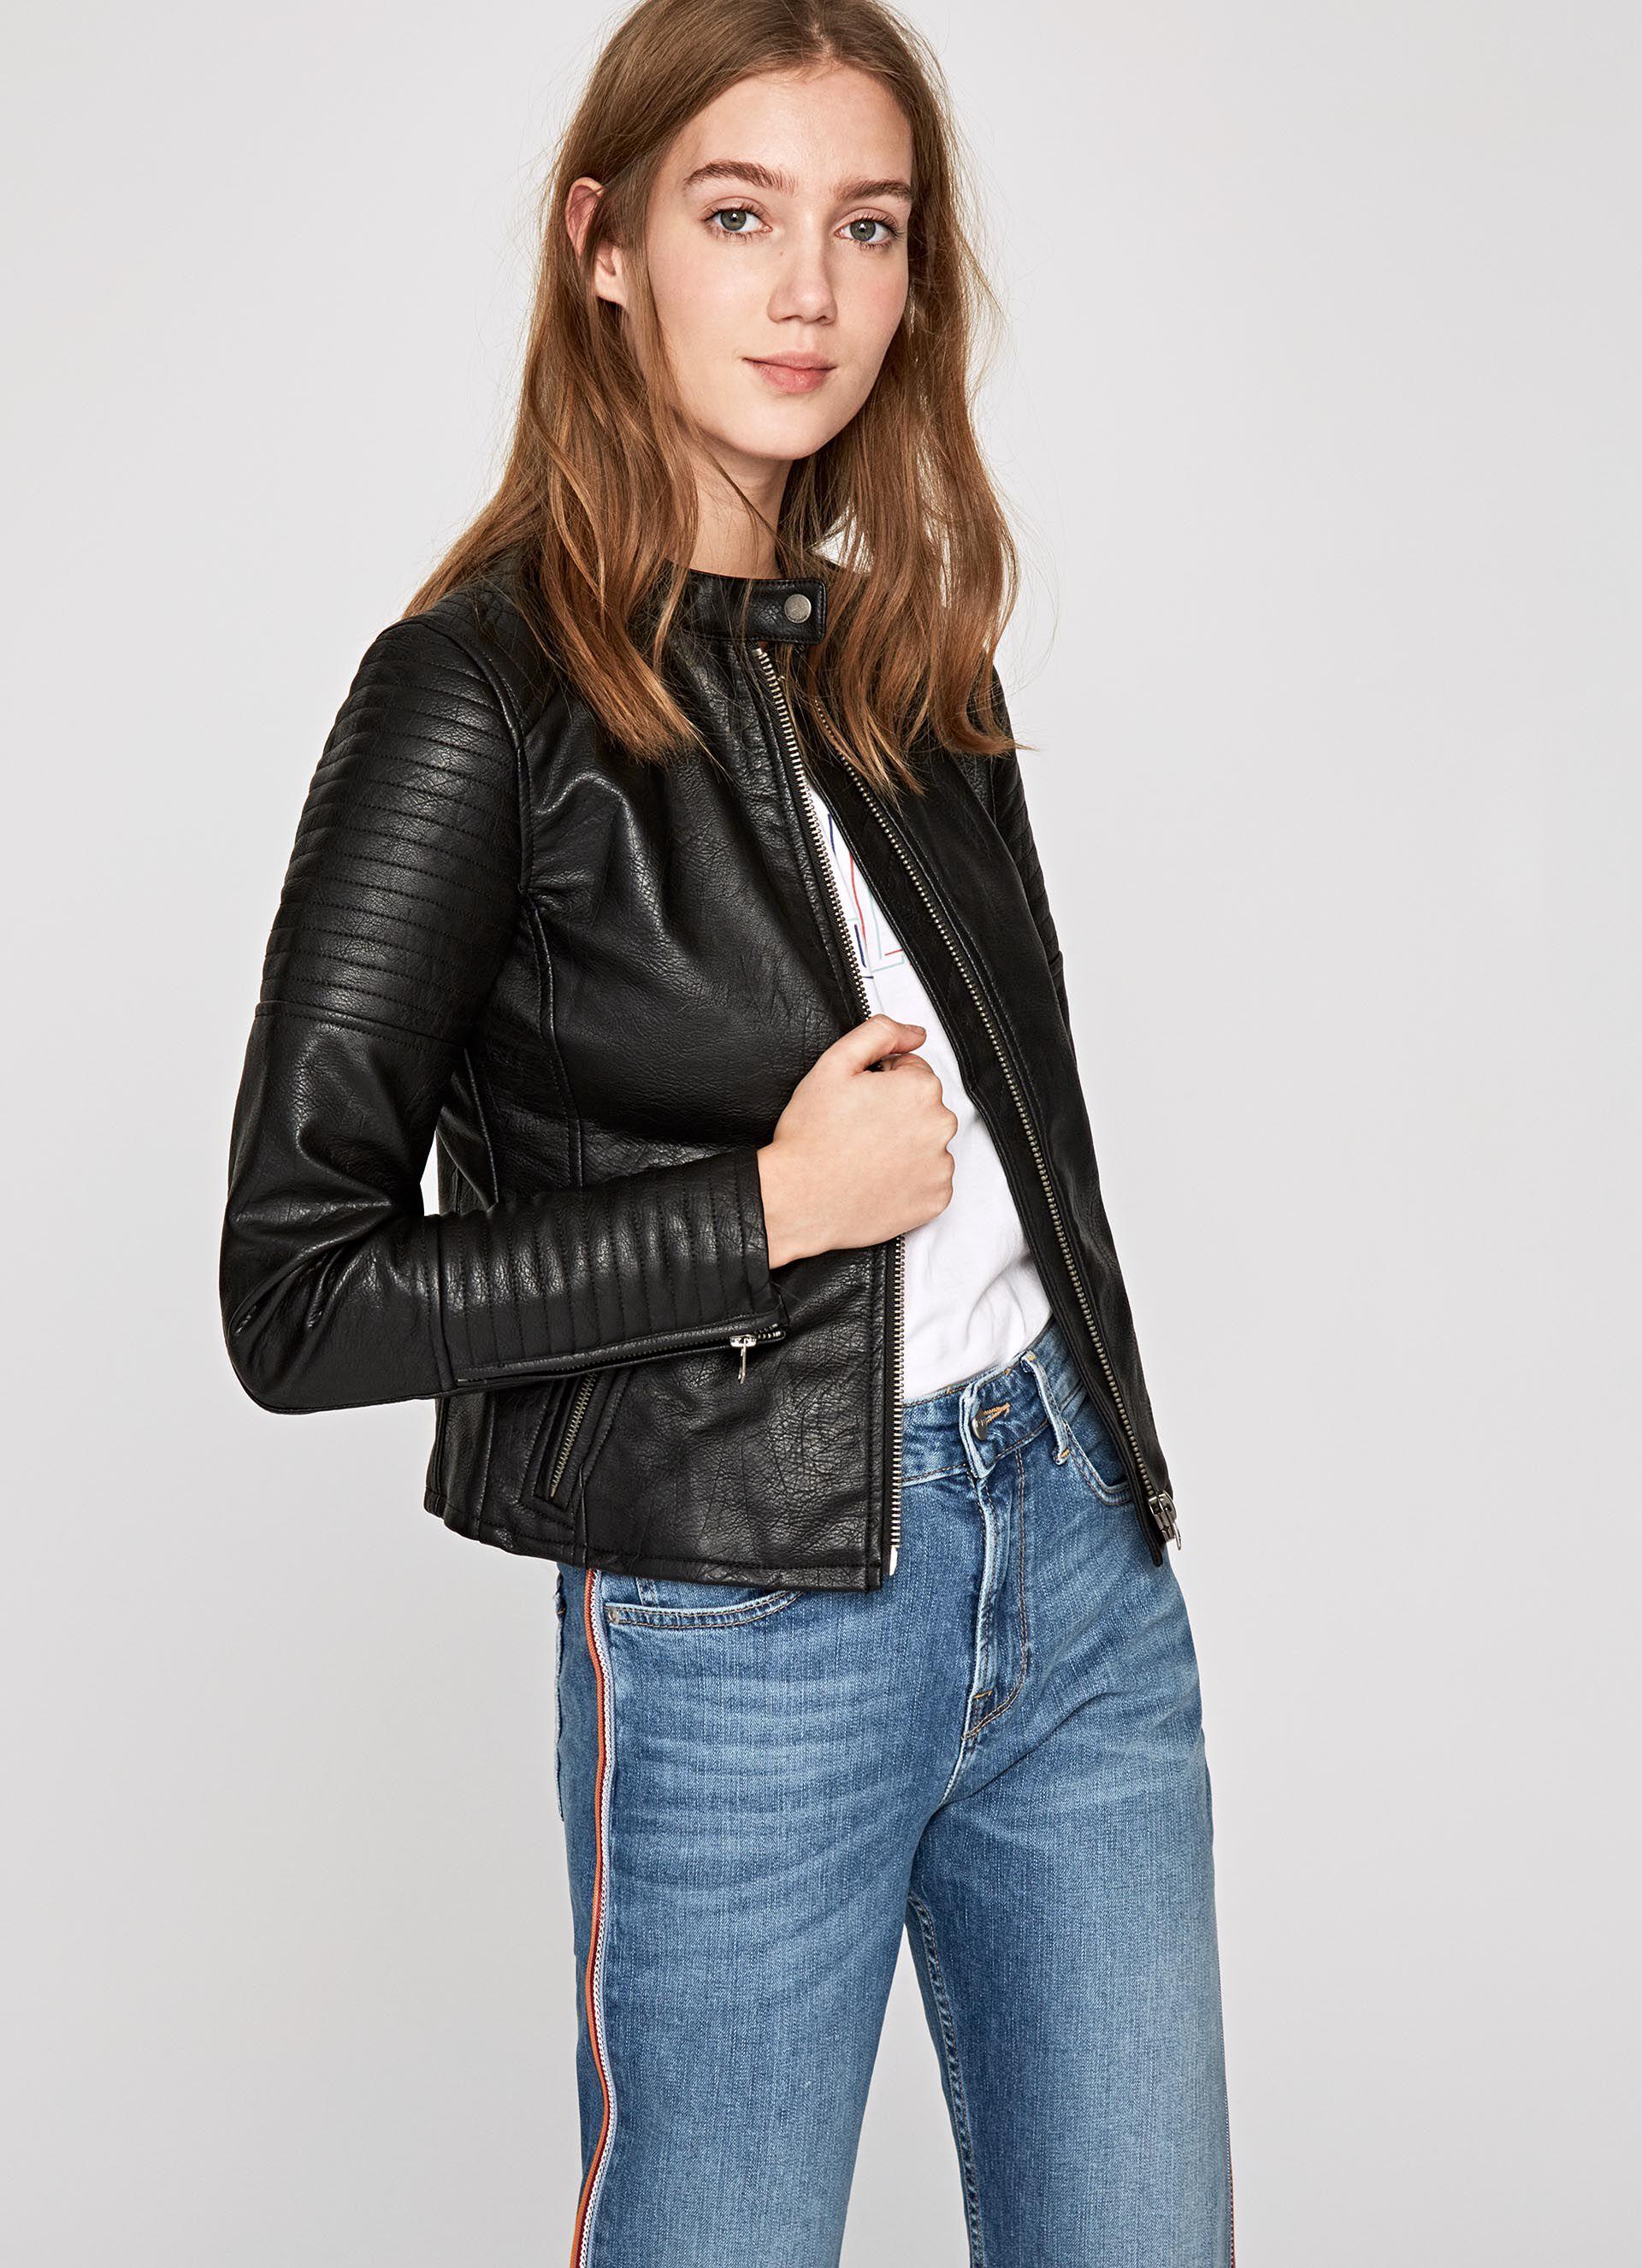 Mujer De Jeans Pepe Abrigos Cazadoras Y London 0wqtxaHE